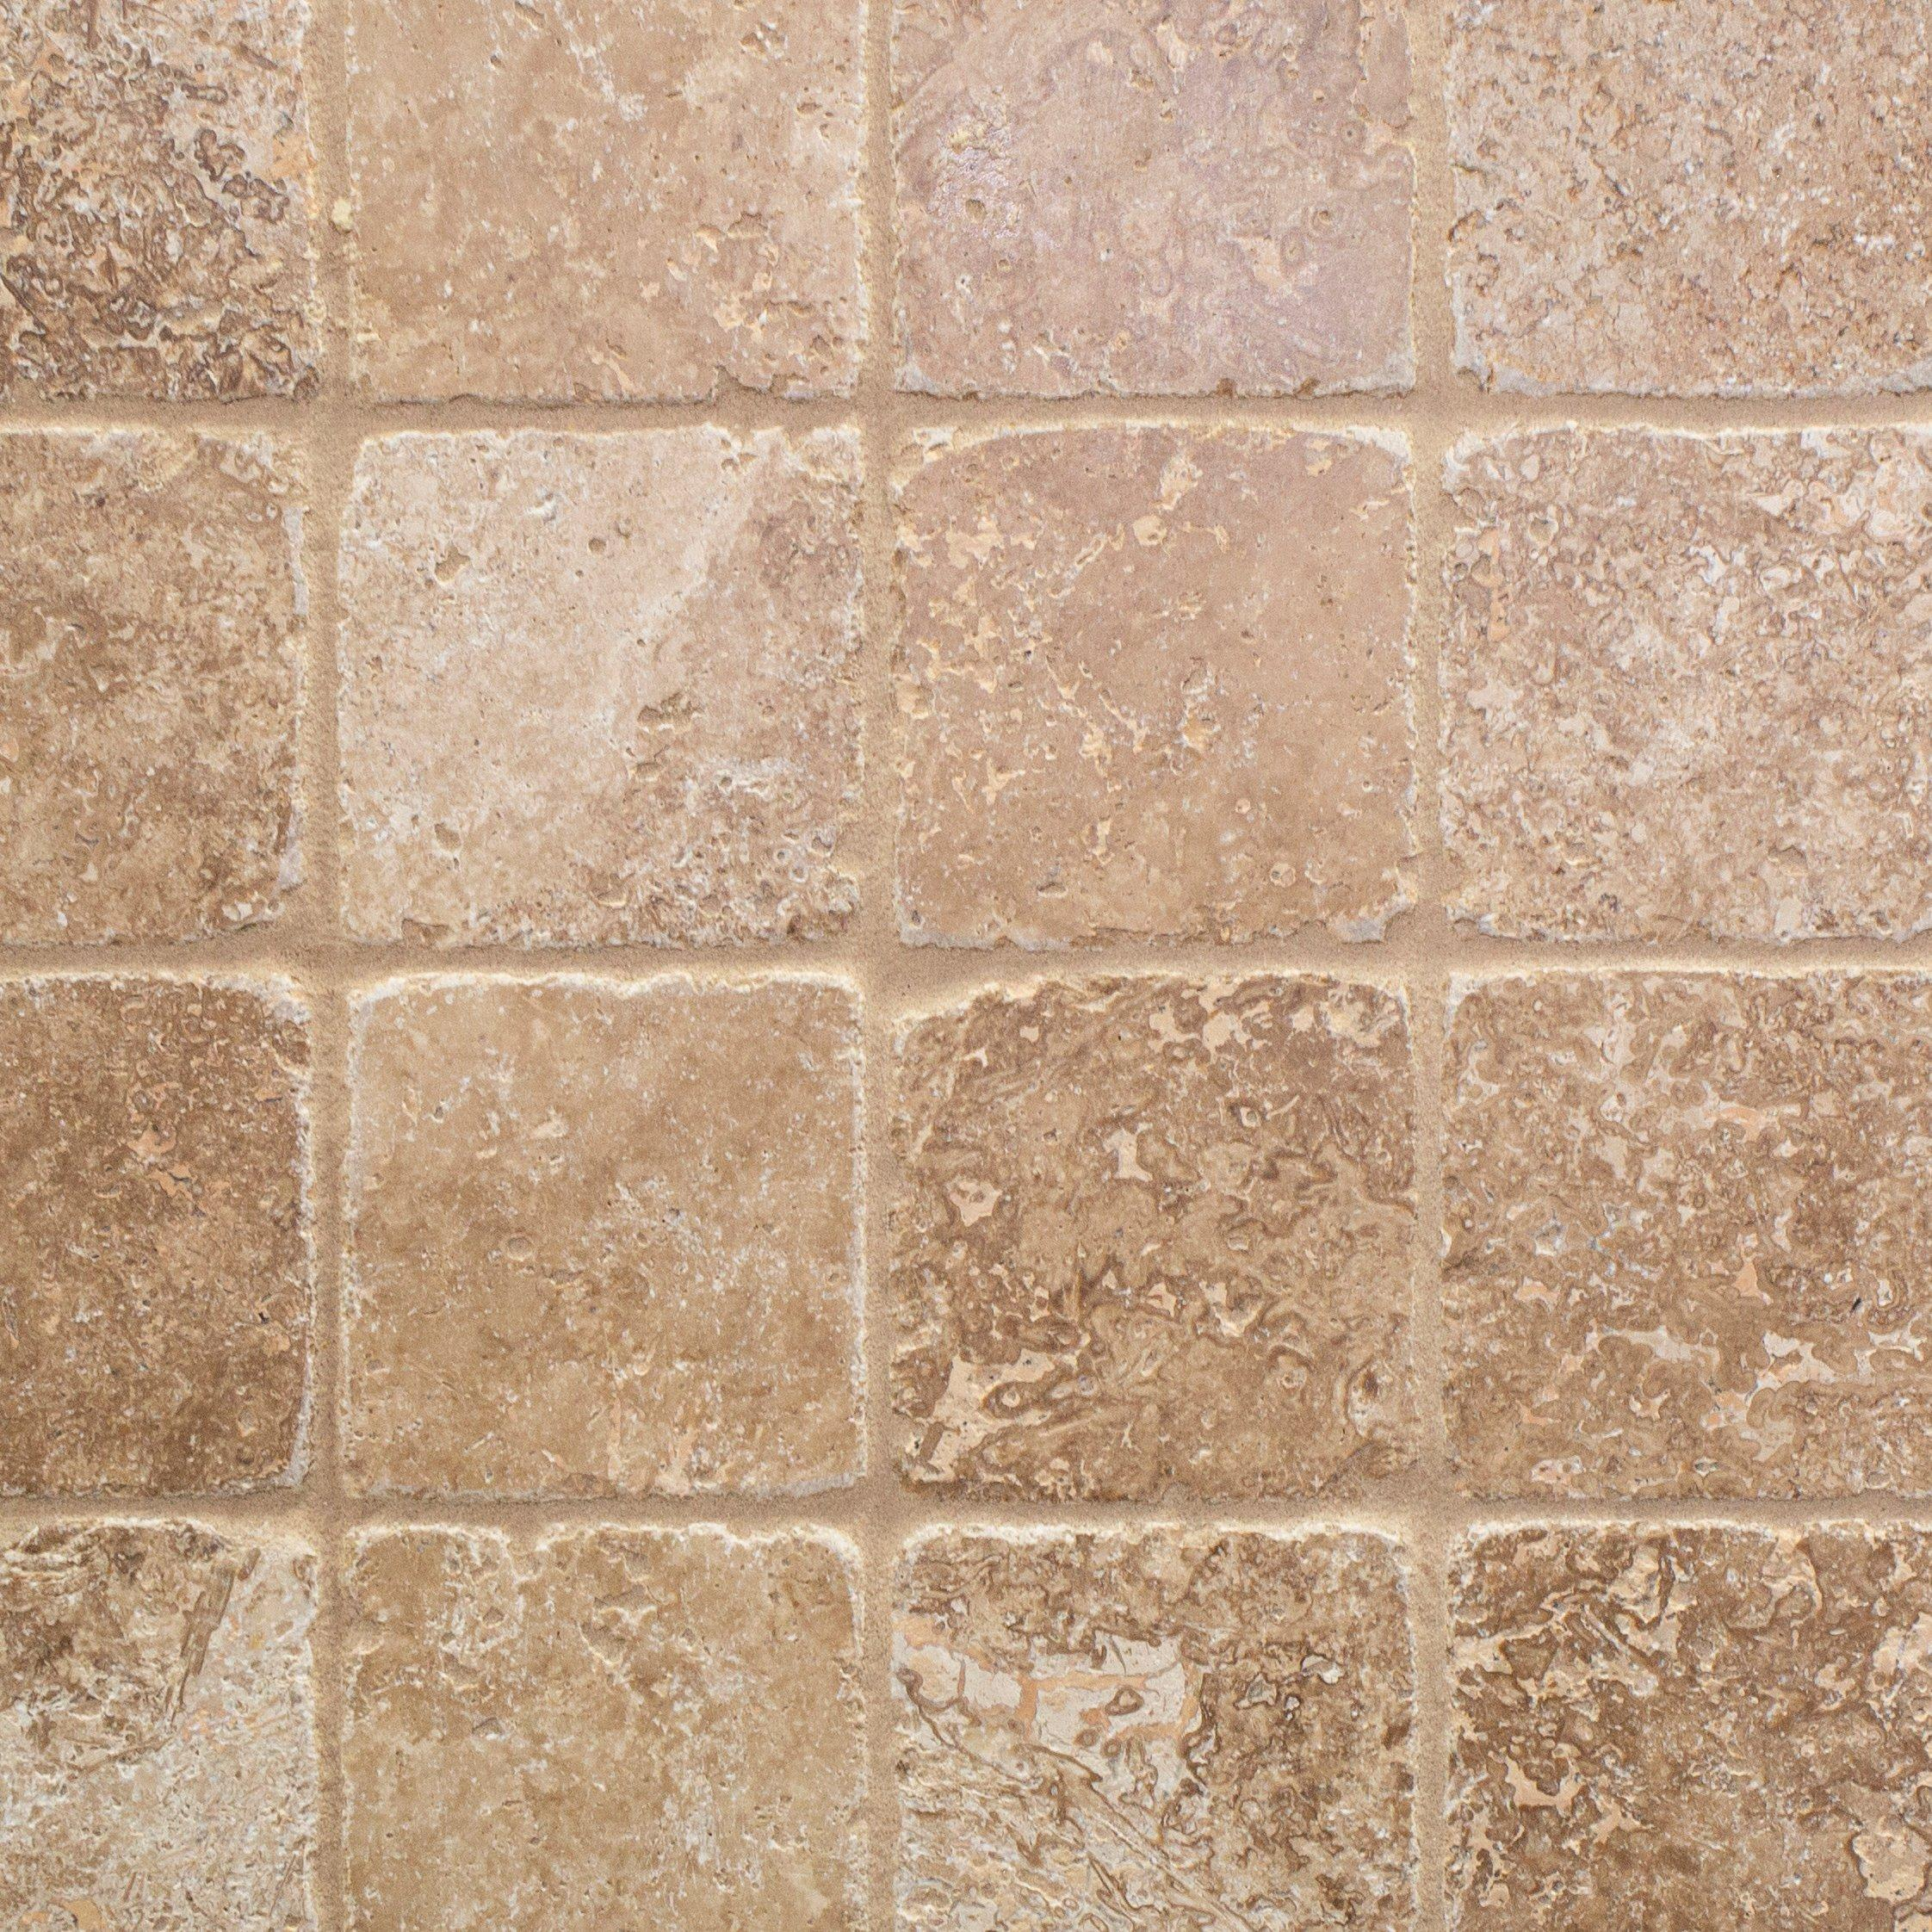 - Noce 4 X 4 Travertine Tumbled Tile